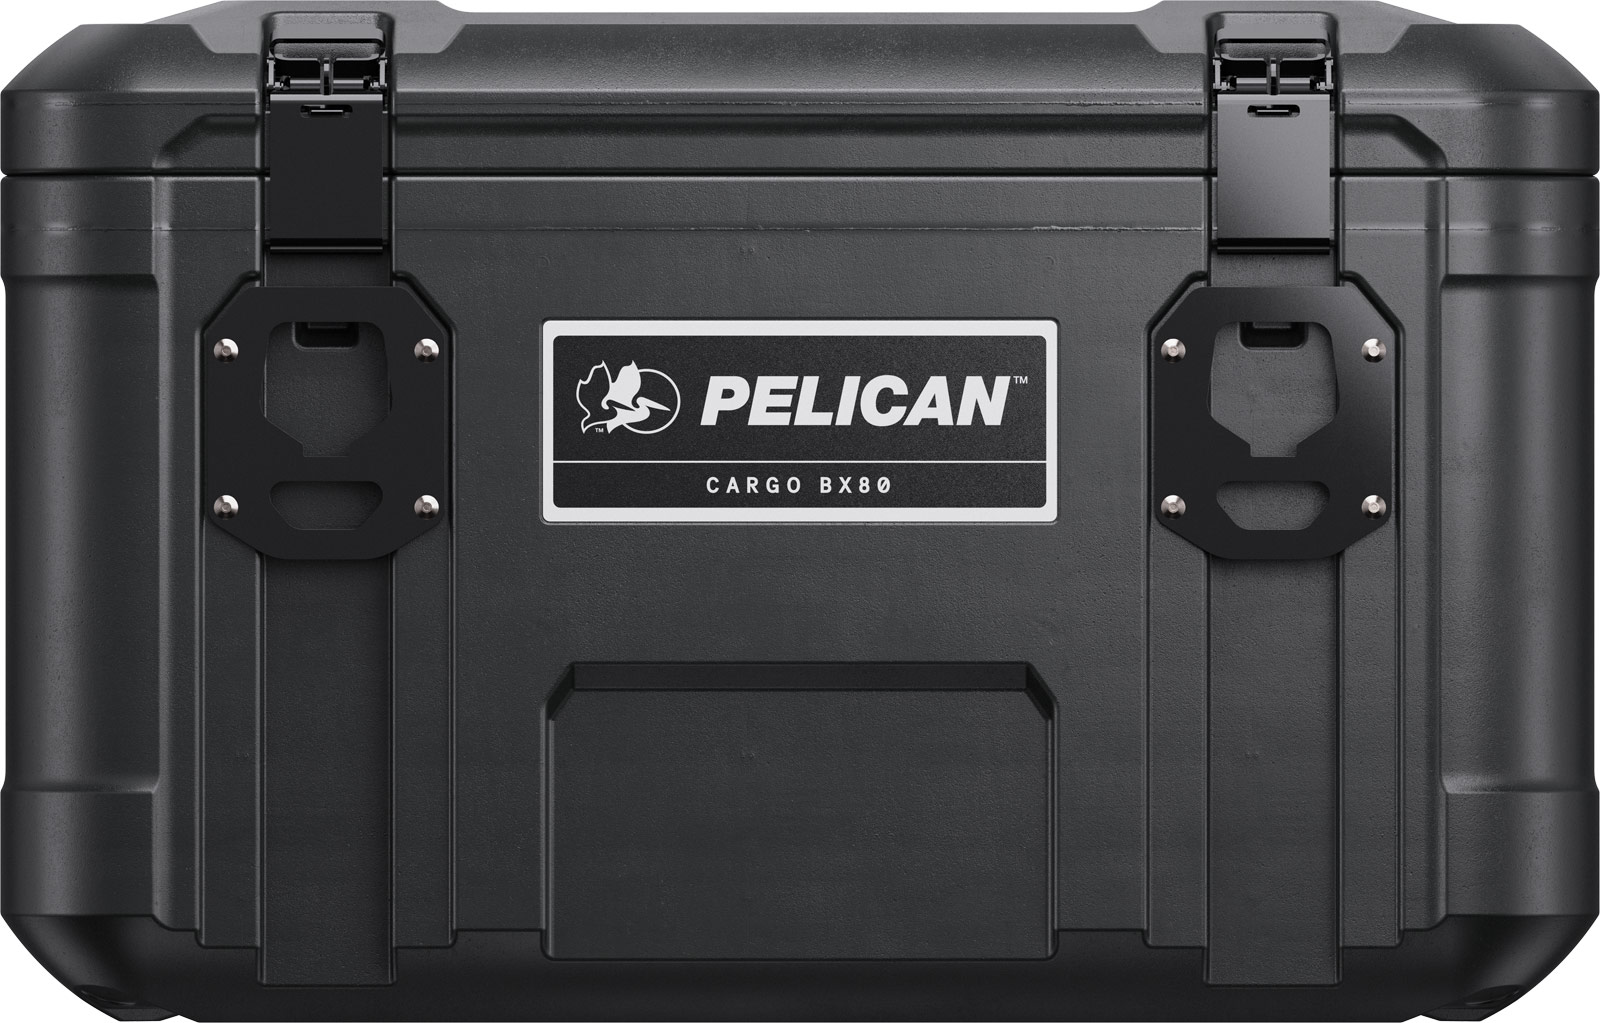 pelican cargo bx80 easy mount case